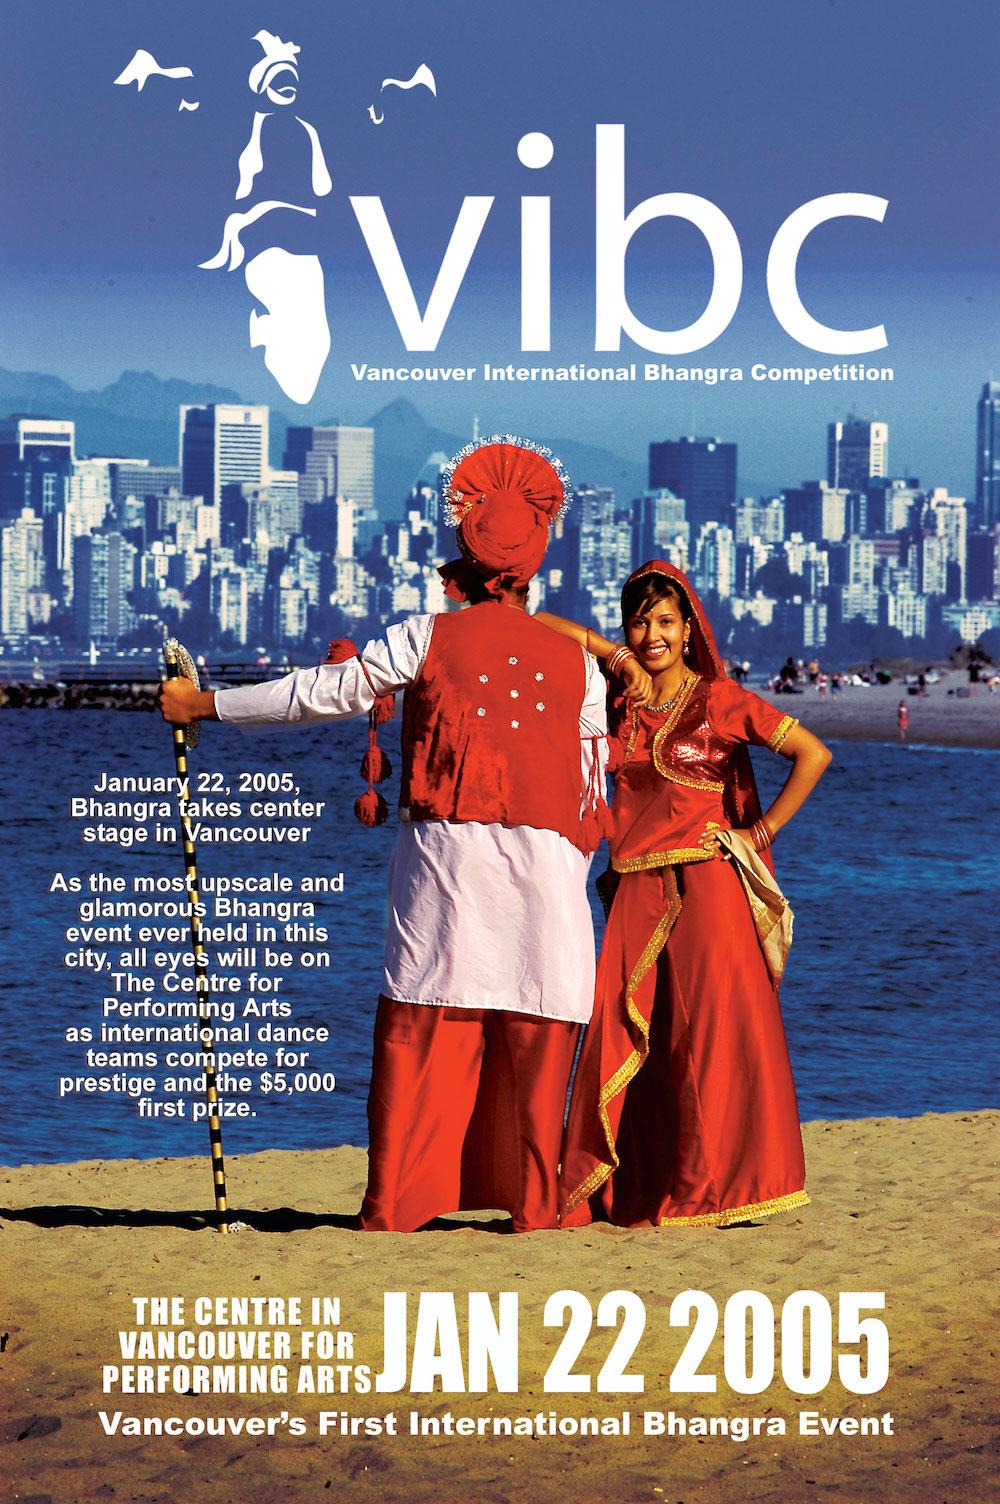 vibc_2005_poster.jpg